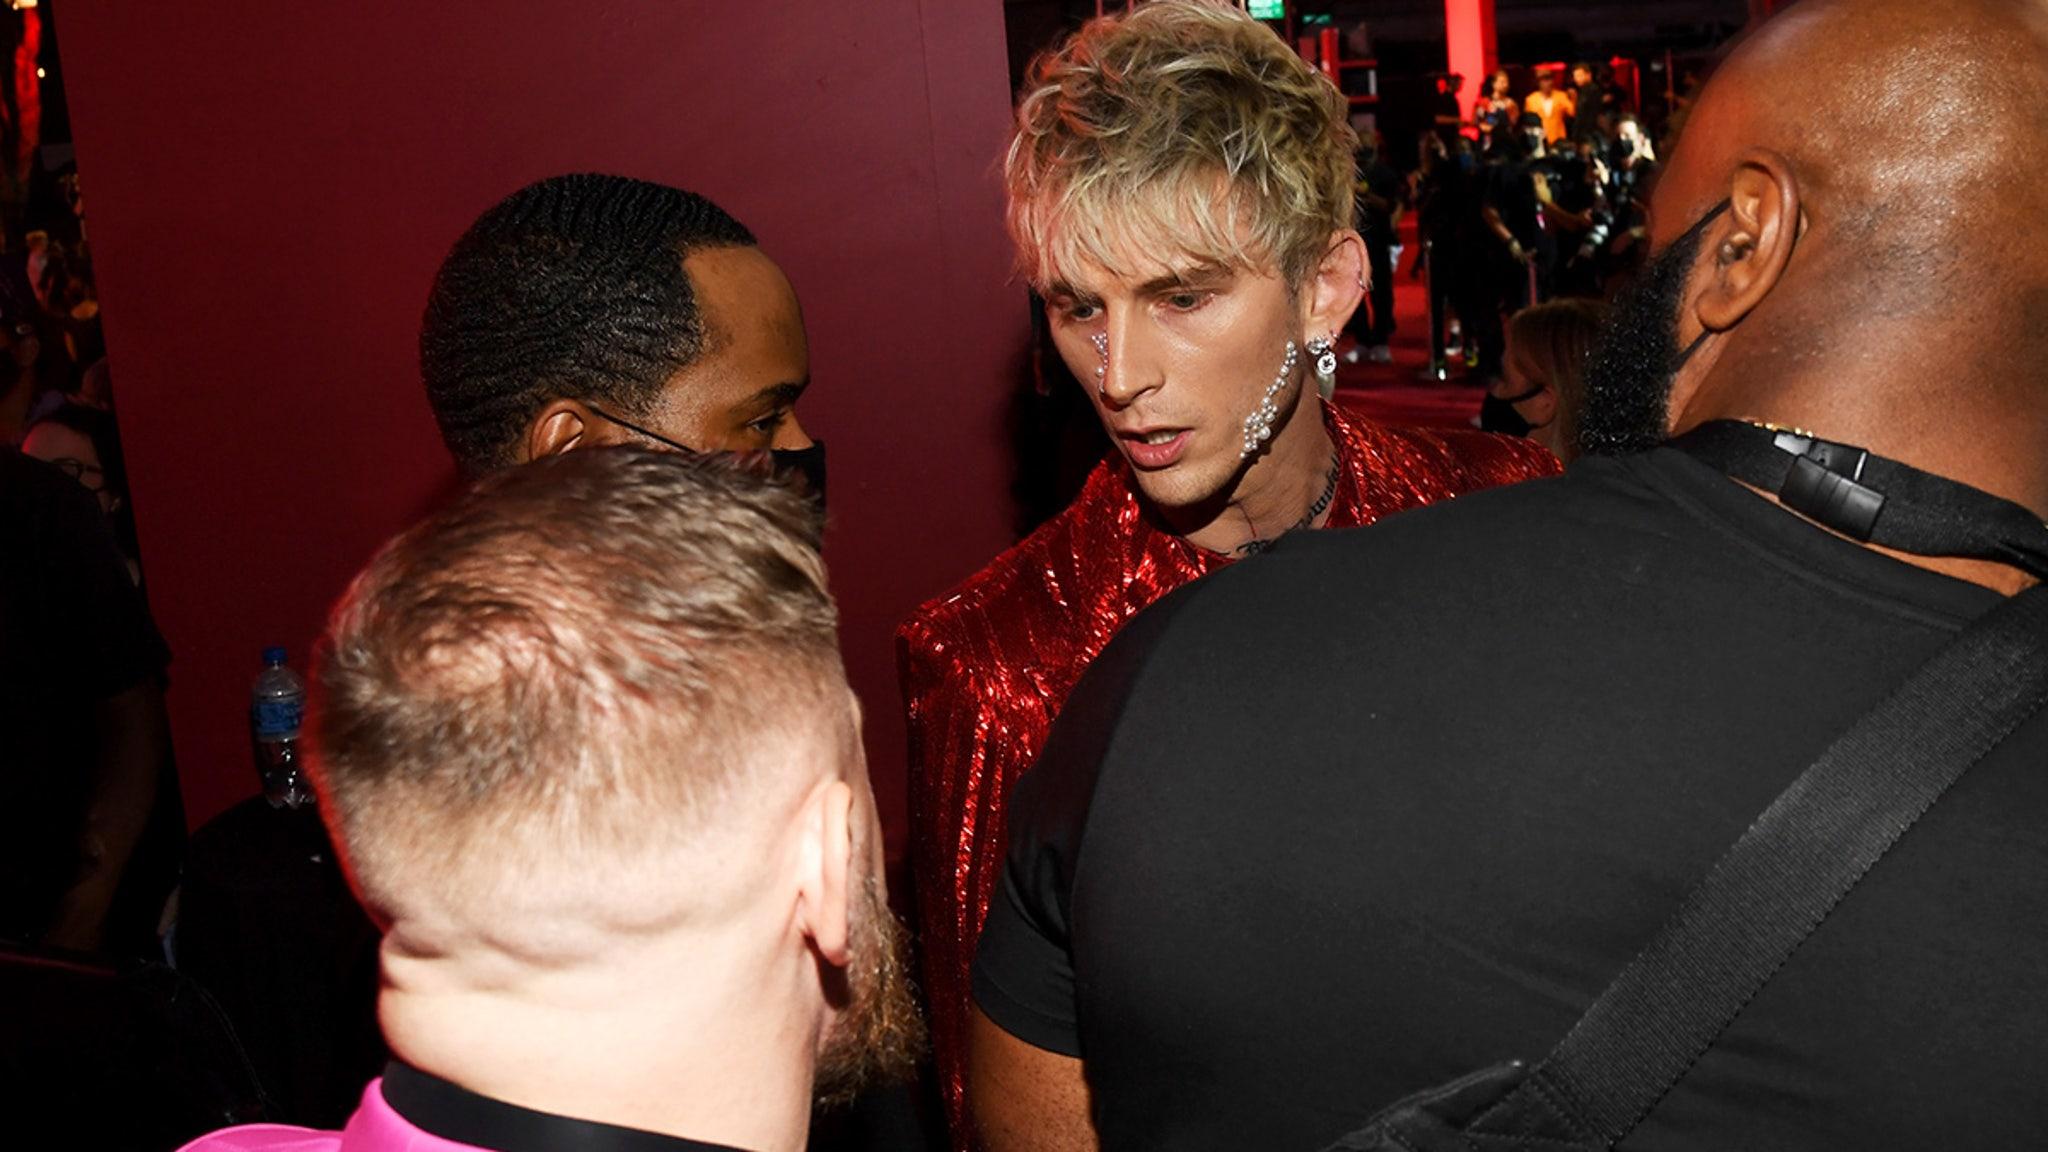 Conor McGregor Gets Into a Squabble with Machine Gun Kelly at VMAs